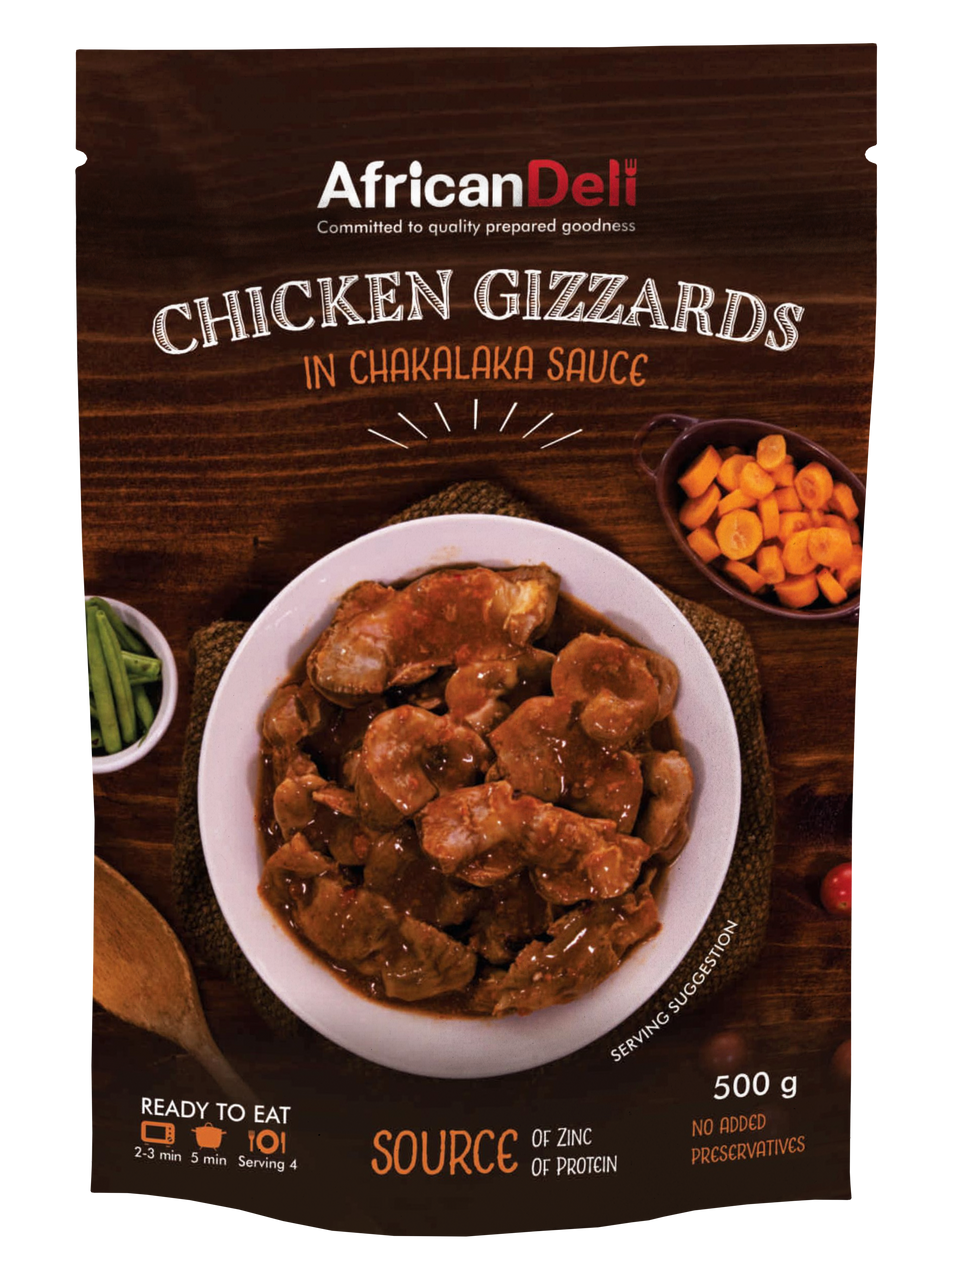 Chicken Gizzards in Chakalaka Sauce 500g